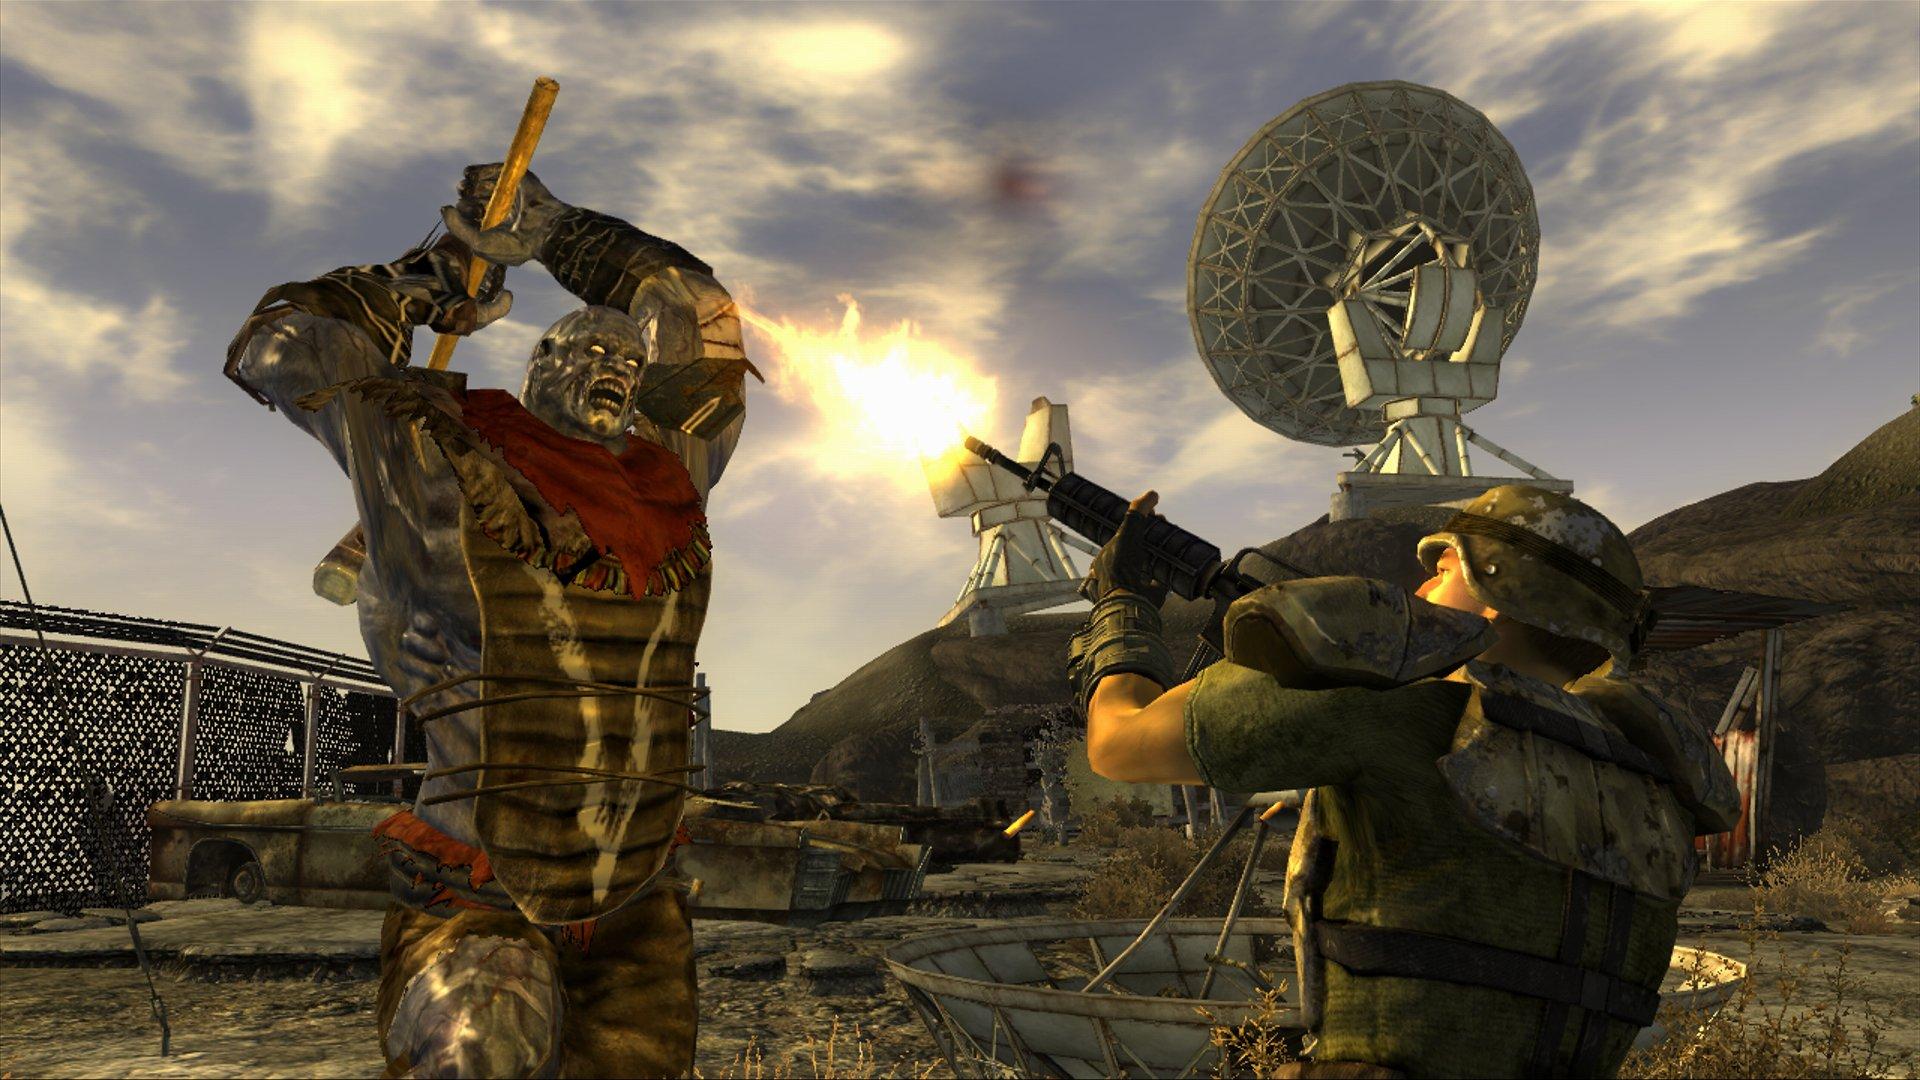 Fallout: New Vegas PC להורדה בטורנט מהיר Fallout3